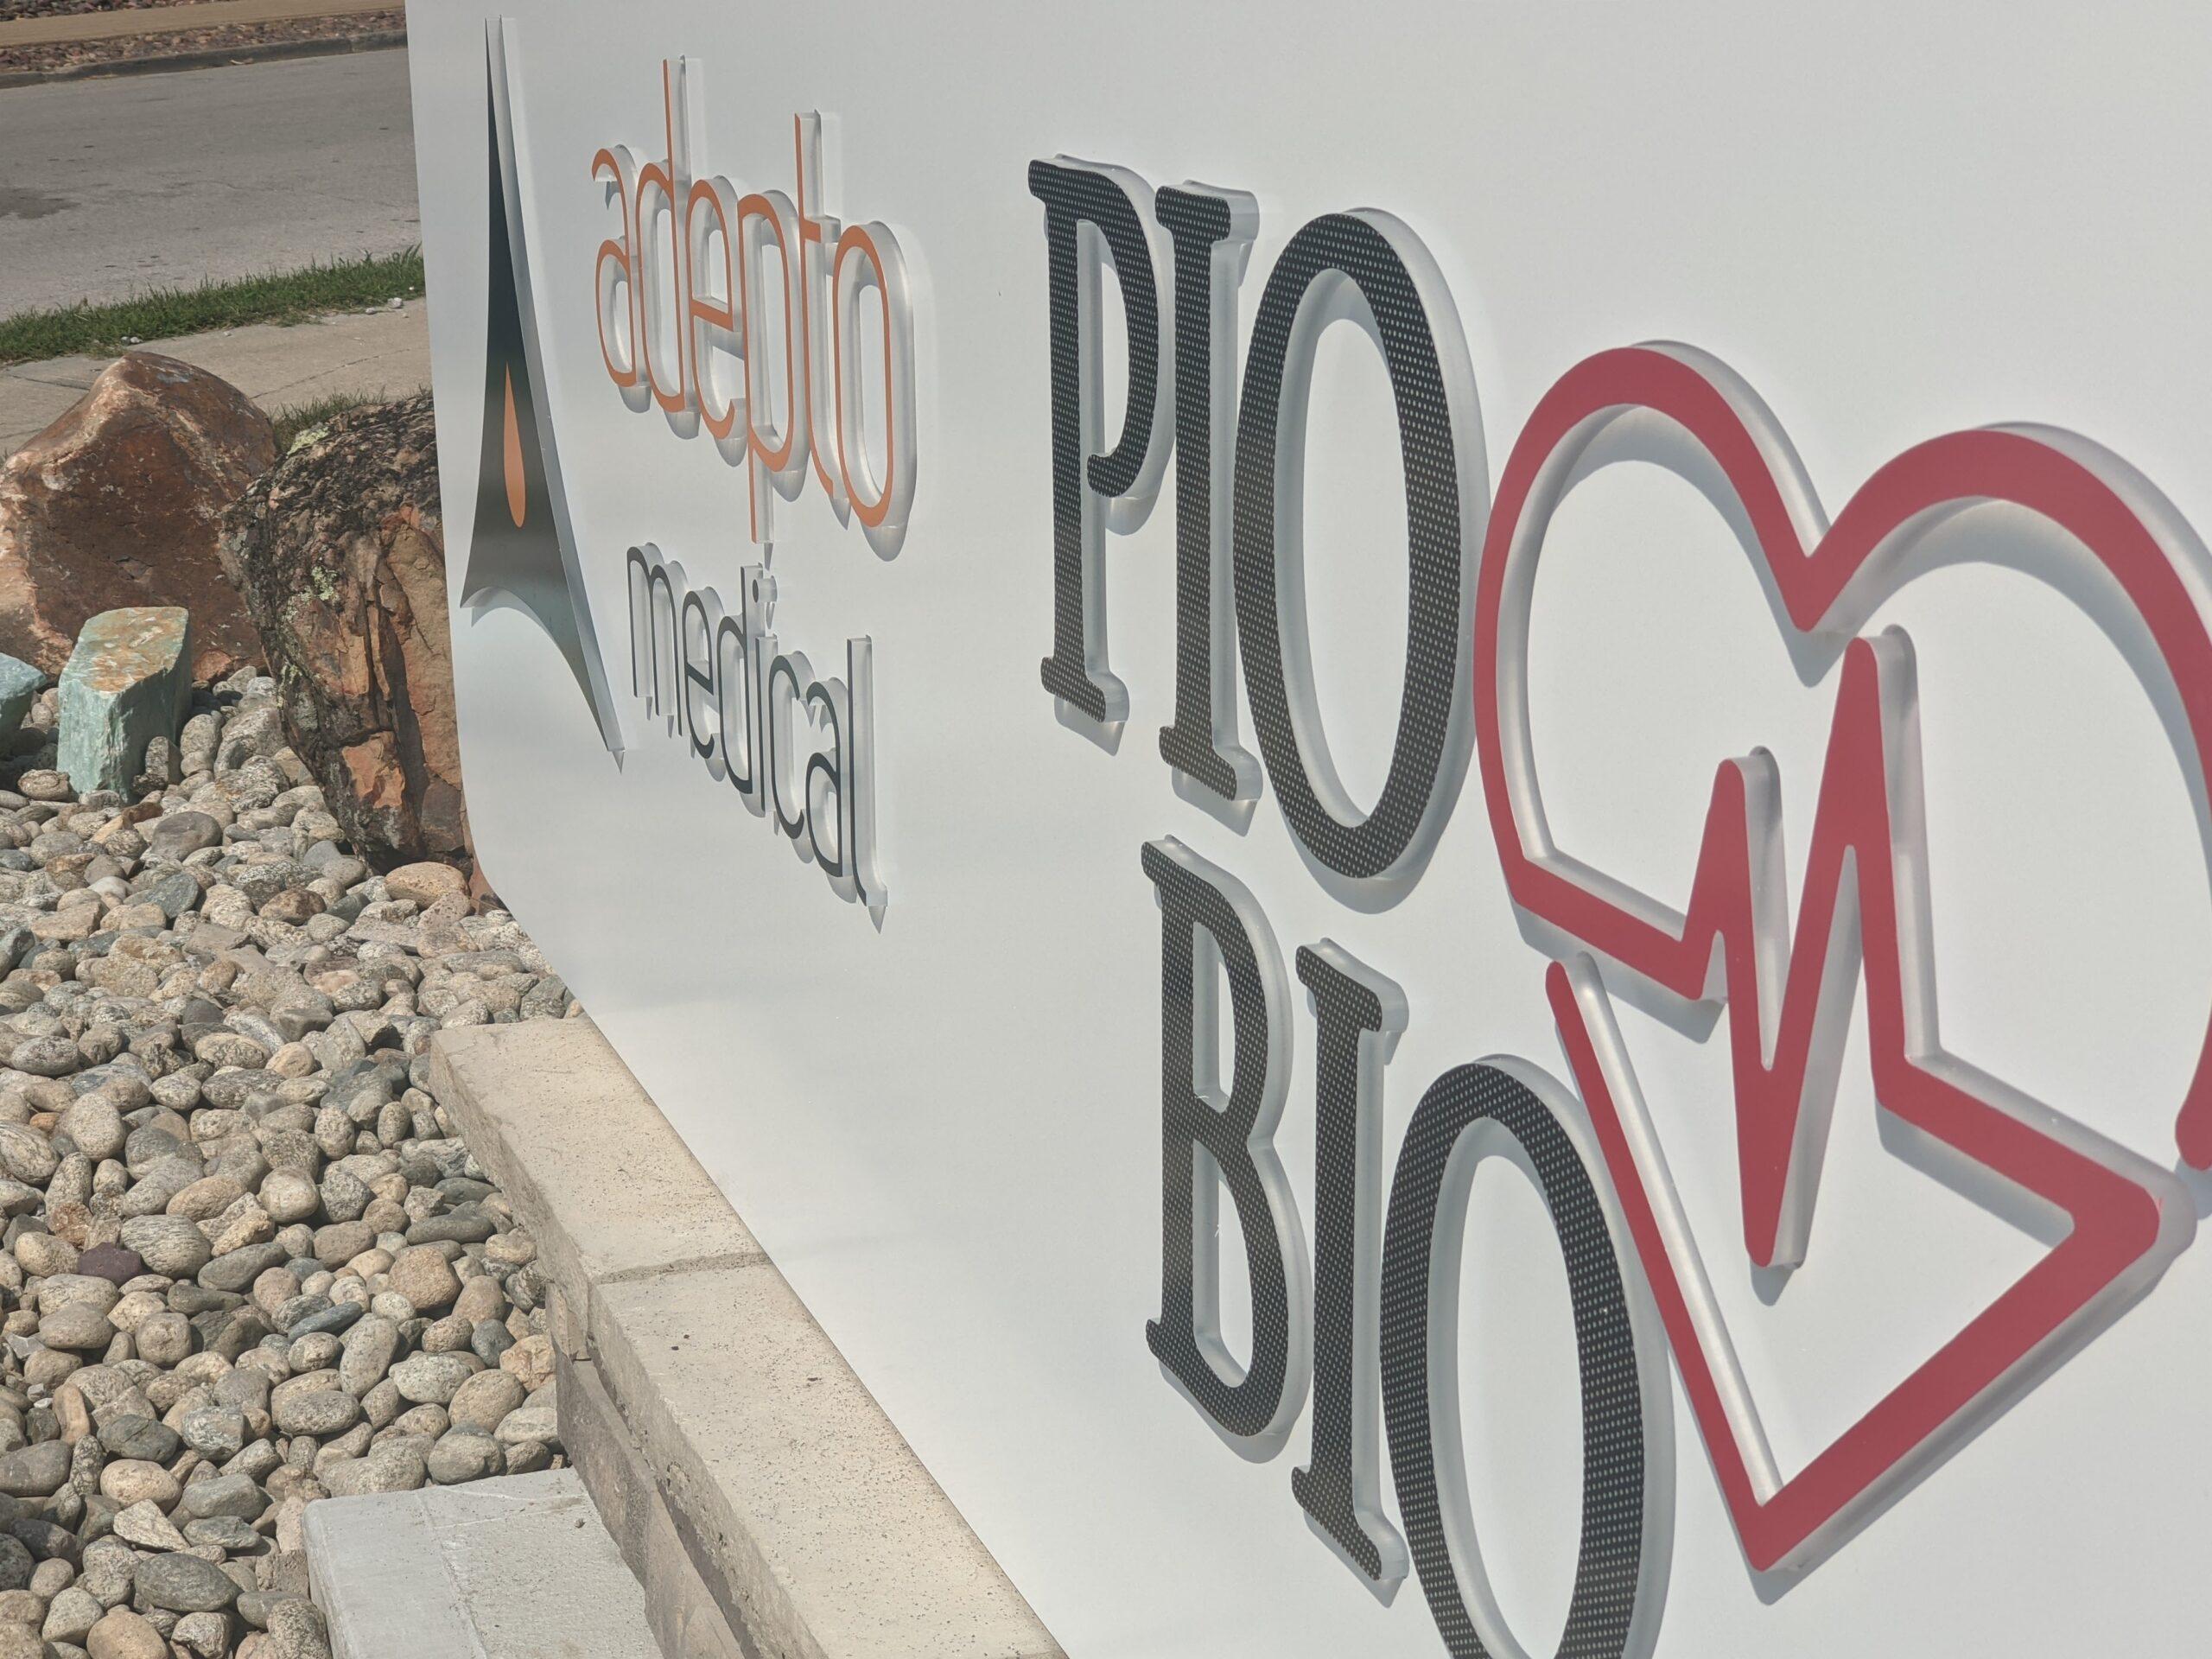 piobio2